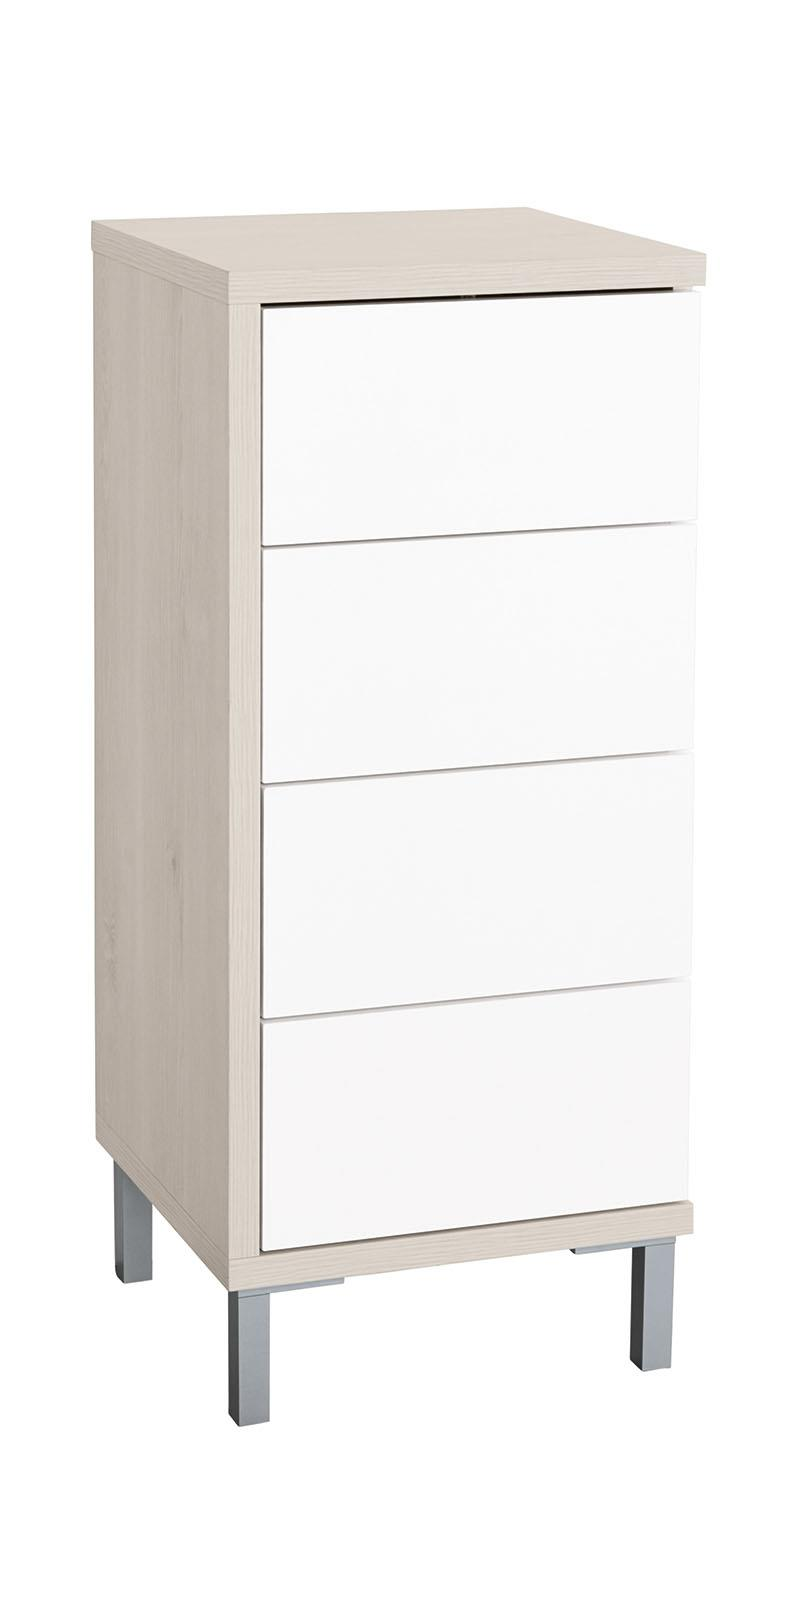 livarno living kommode bad kommode weiss l rche kommoden schrank cab35xh79xt33cm ebay. Black Bedroom Furniture Sets. Home Design Ideas